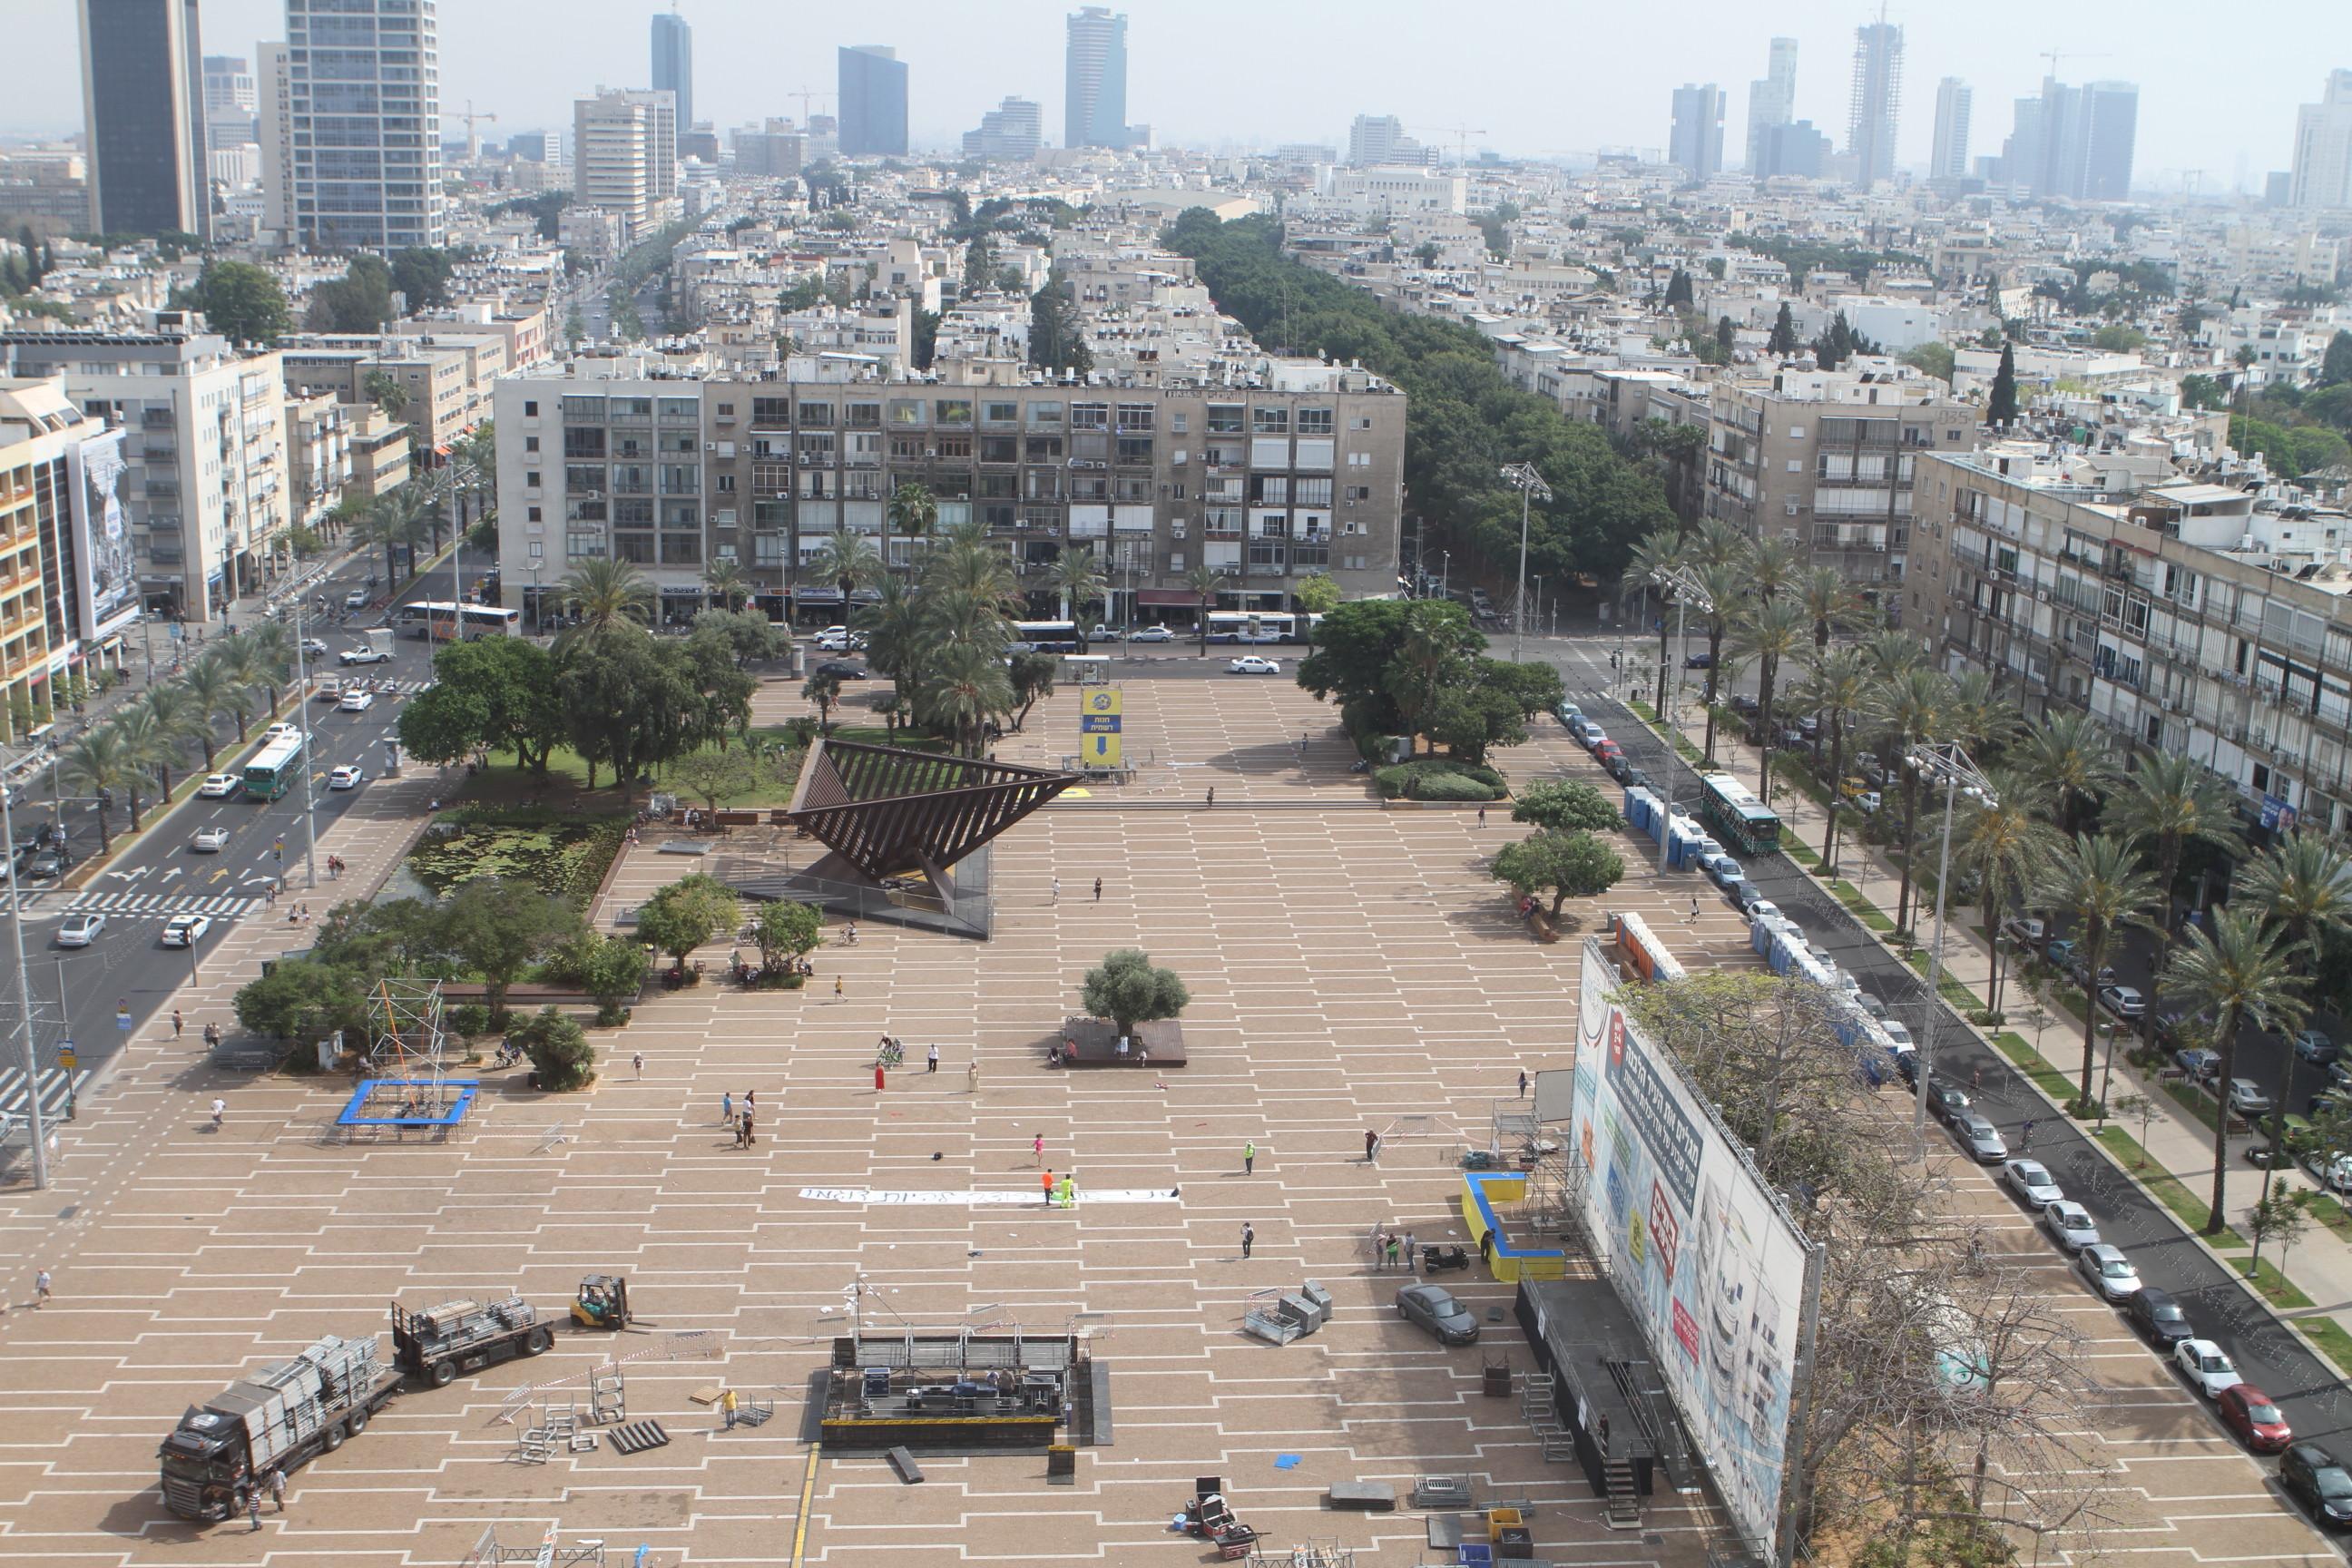 Tel Aviv Pre-Yom Kippur Event At Rabin Square Canceled Amid Social Media Threats To Boycott Entertainers